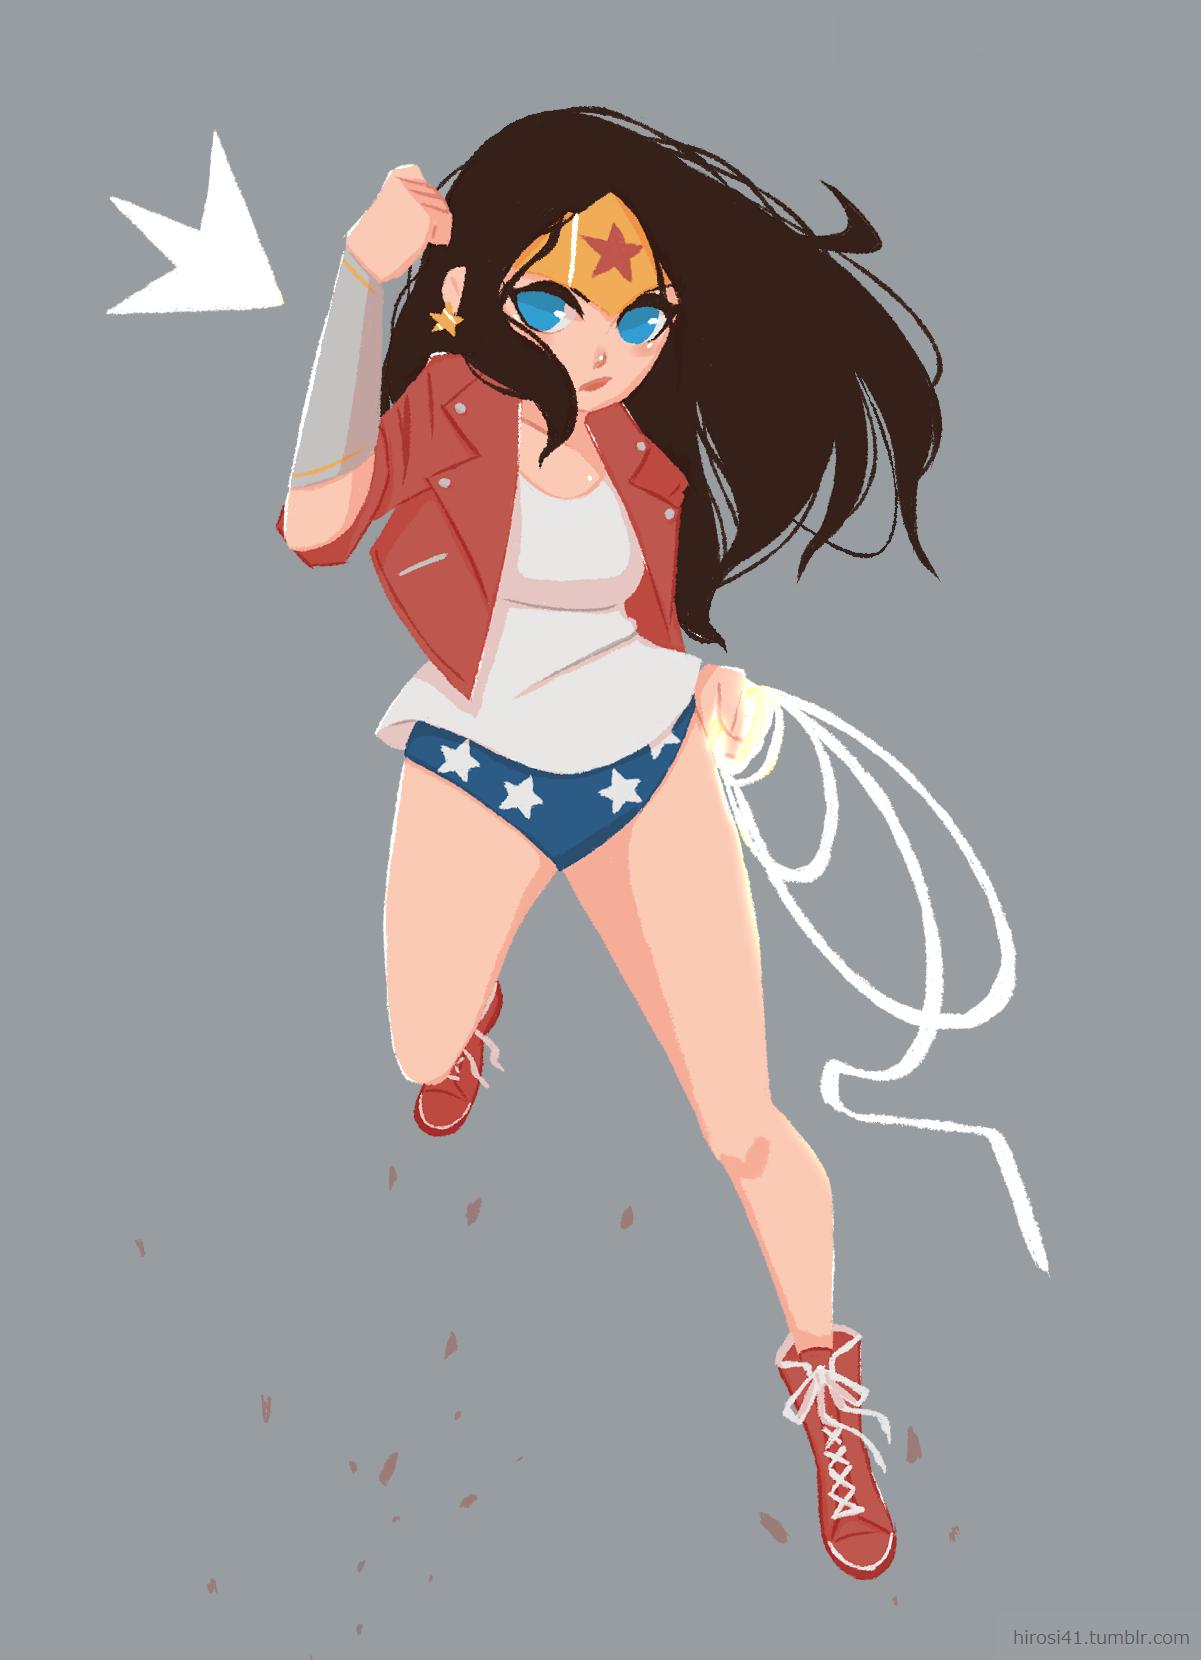 Casual Wonder Woman by hirosi41